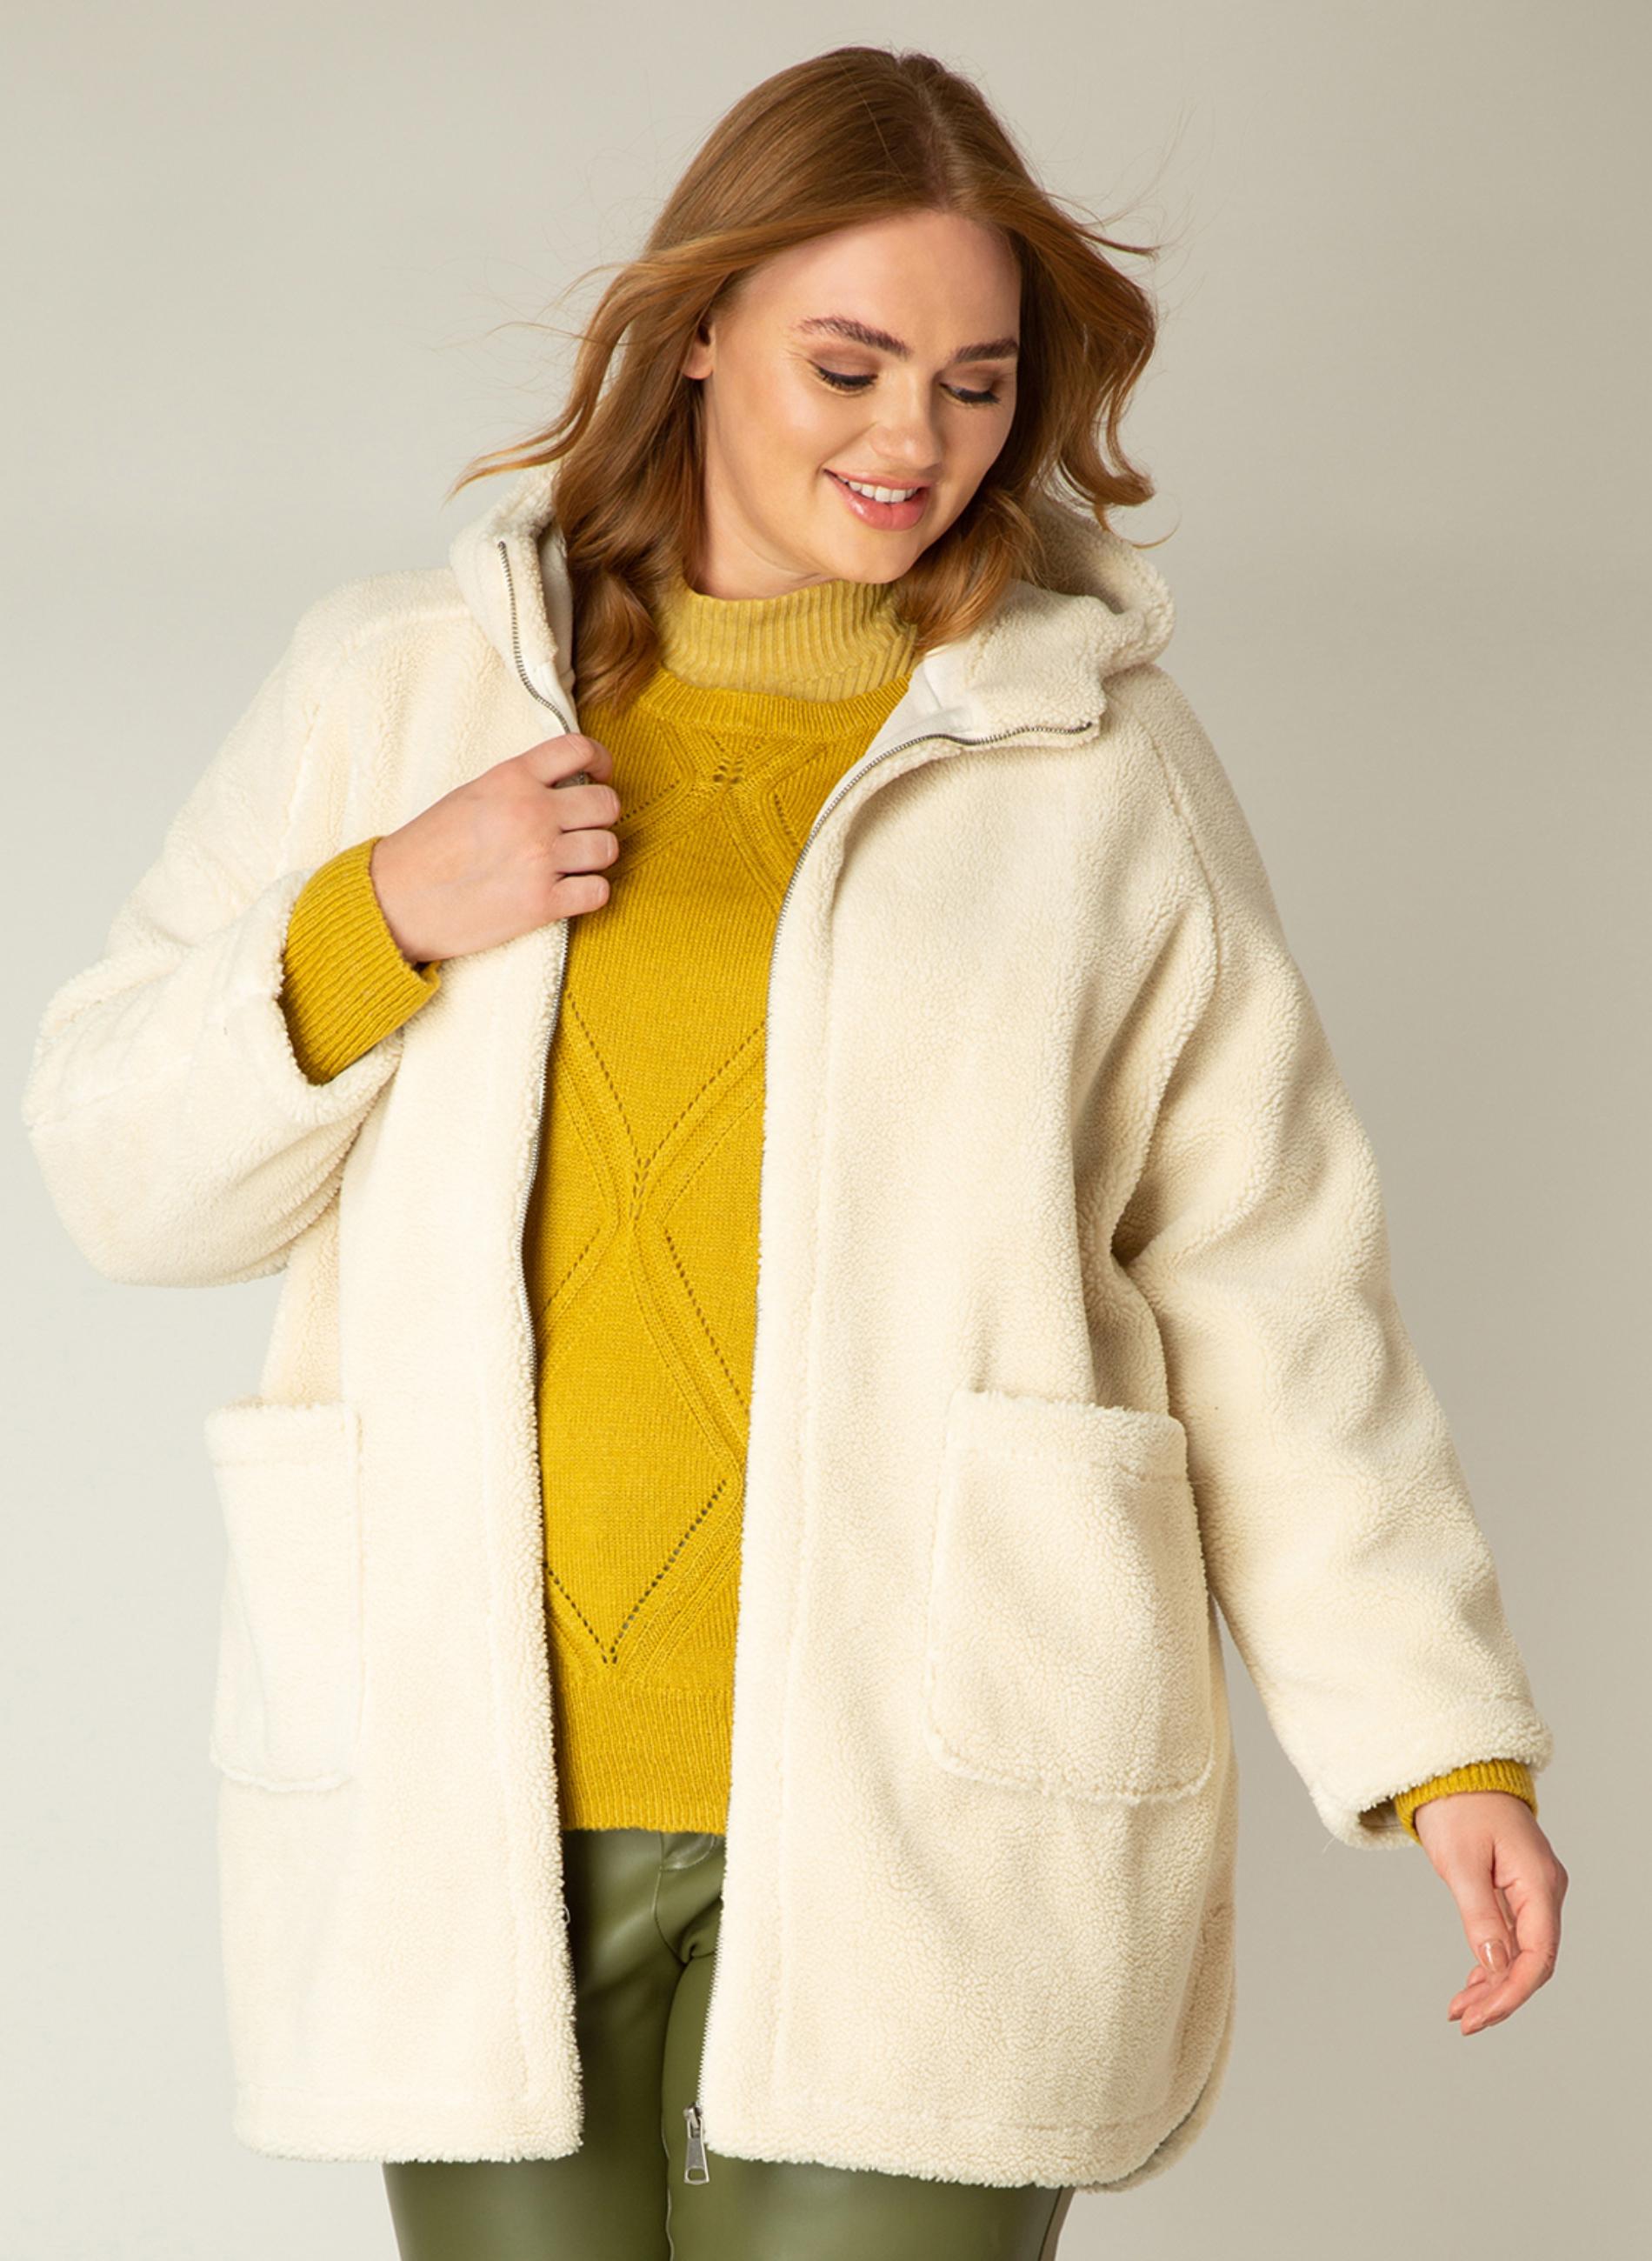 Yesta jack Winter Outerwear